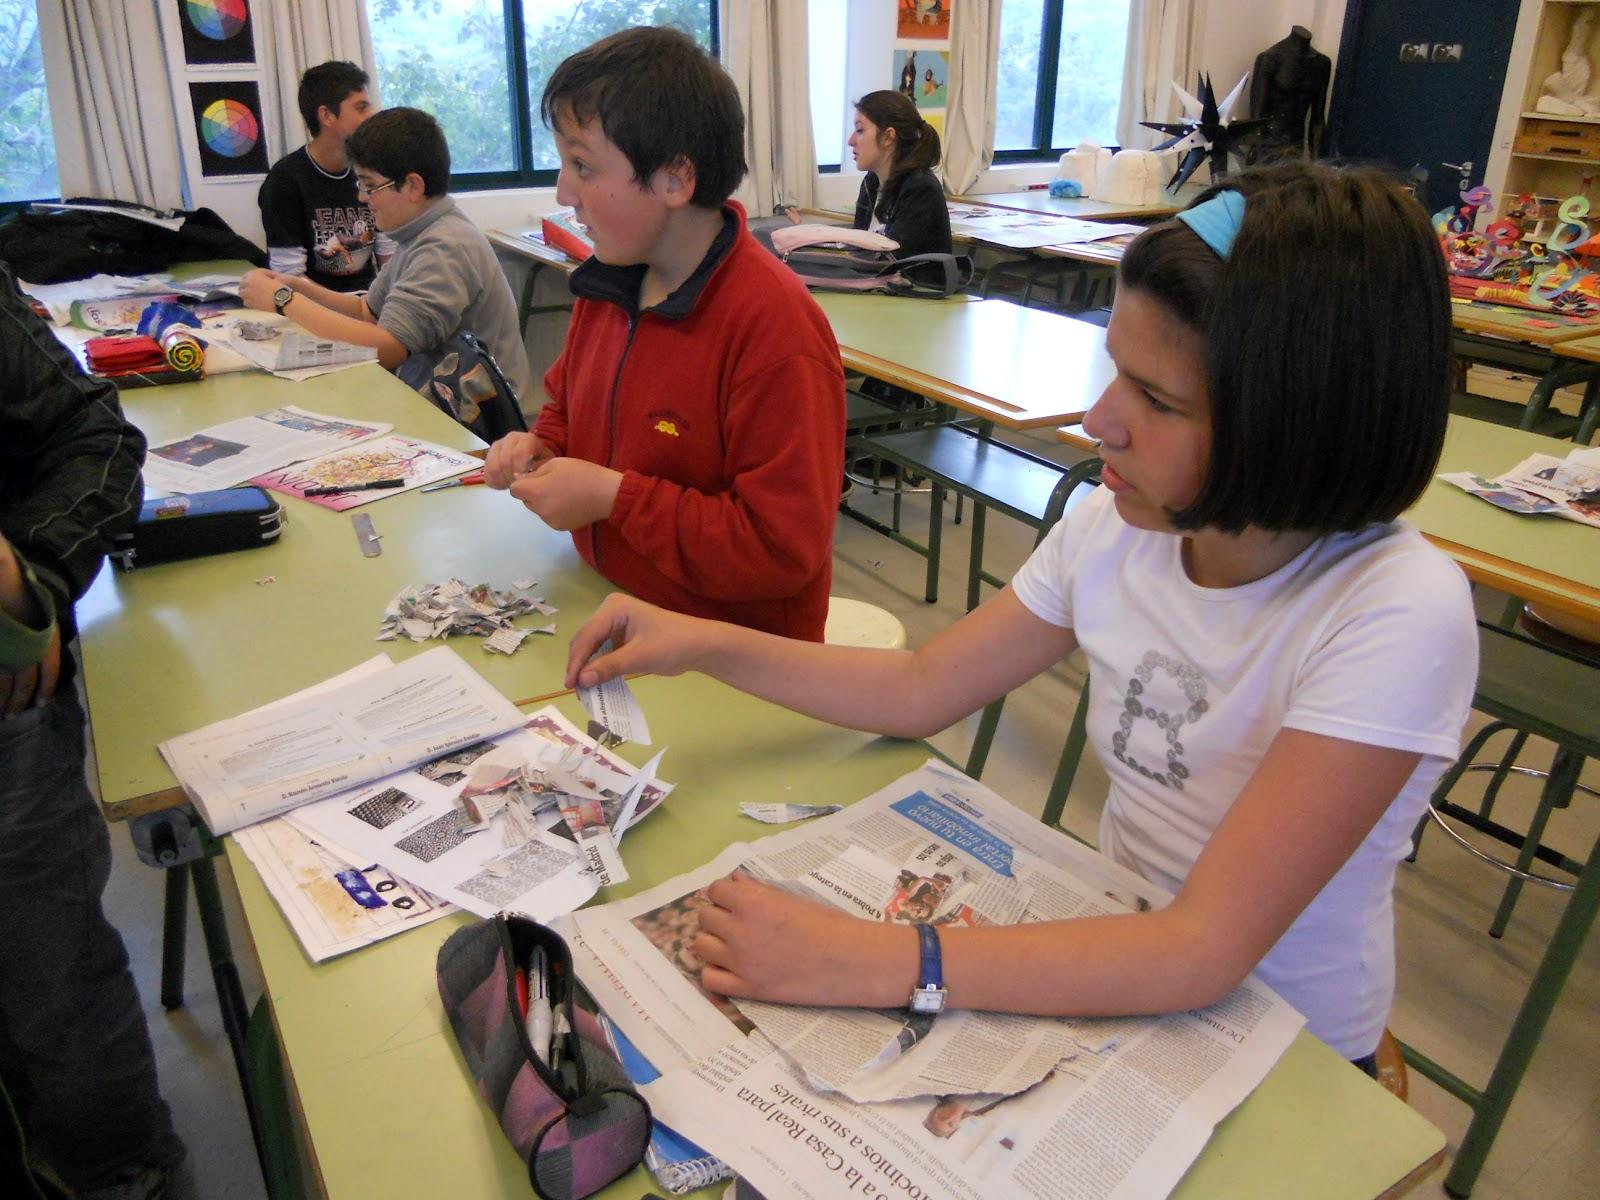 Plasticlass: Marionetas de papel maché